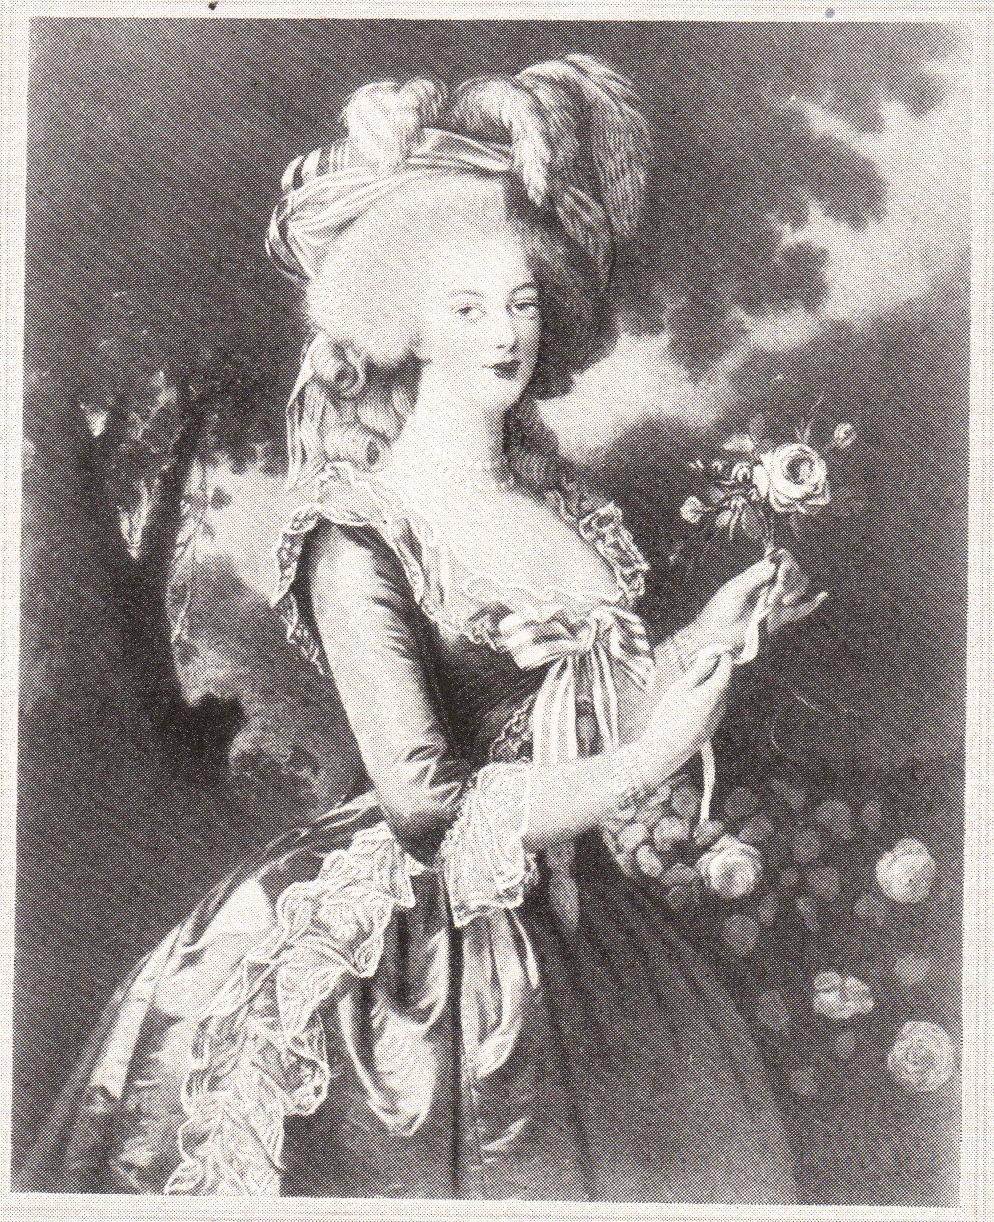 Queen Marie Antoinette of France (1755-1793)